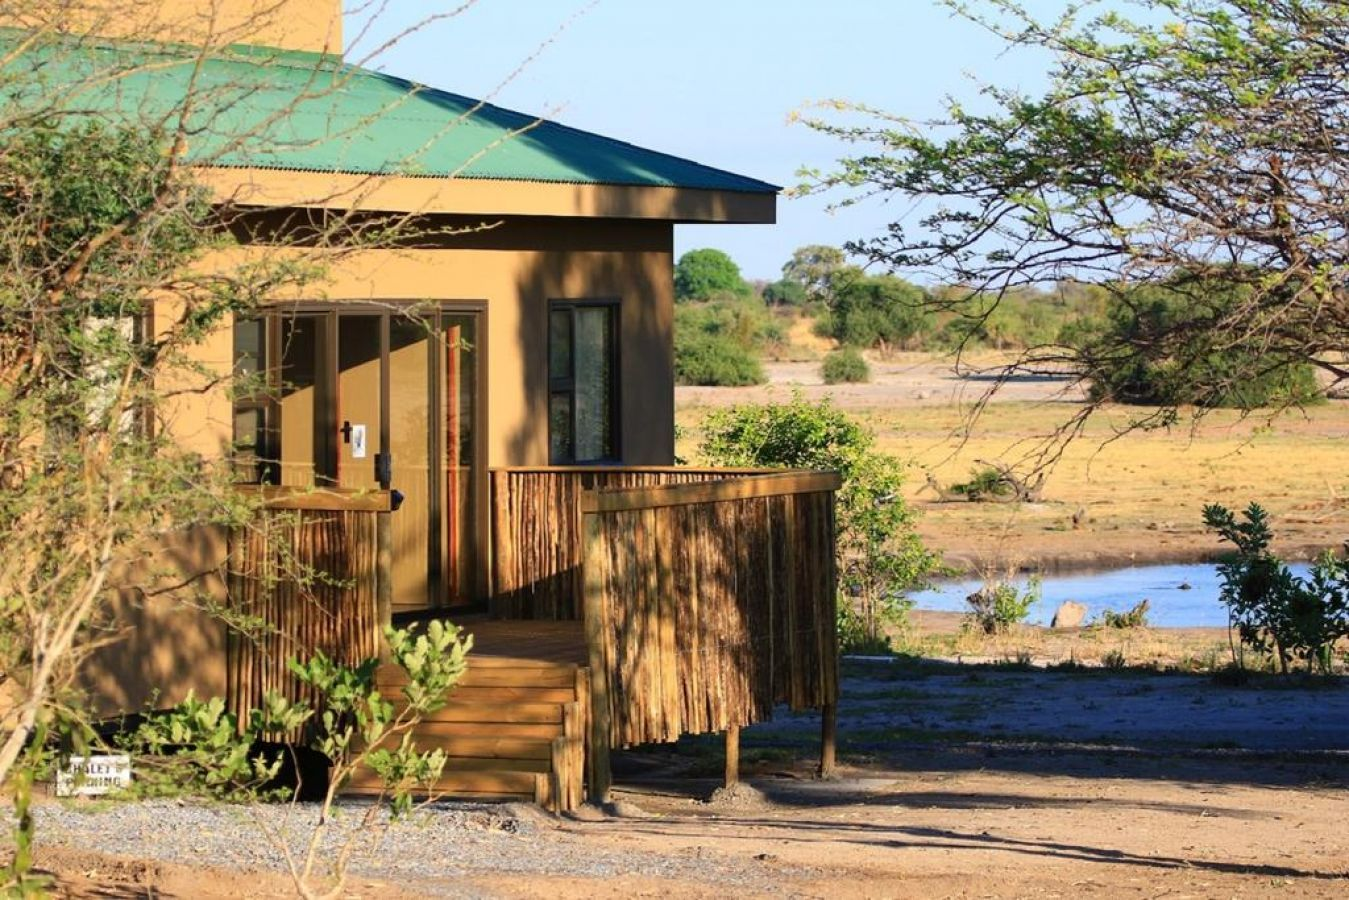 Thobolos Bush Lodge